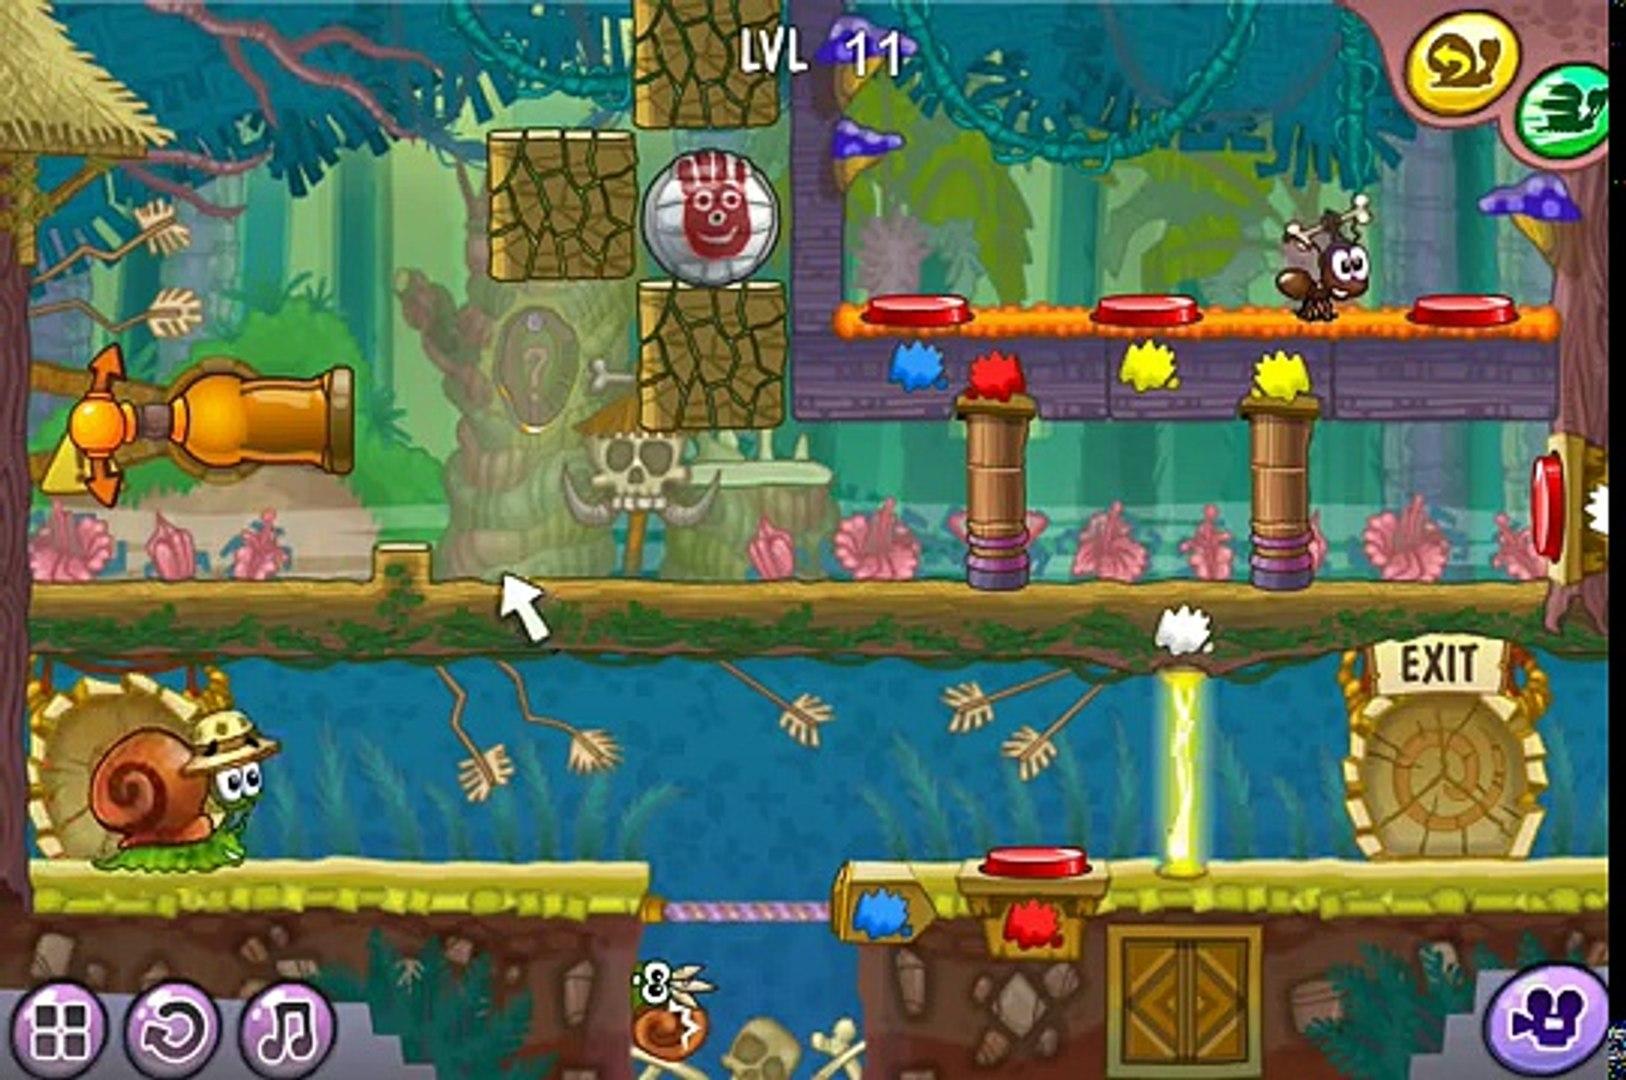 Flash игра Улитка Боб 8 Островная история 2 серия Игра Snail Bob 8 Island Story